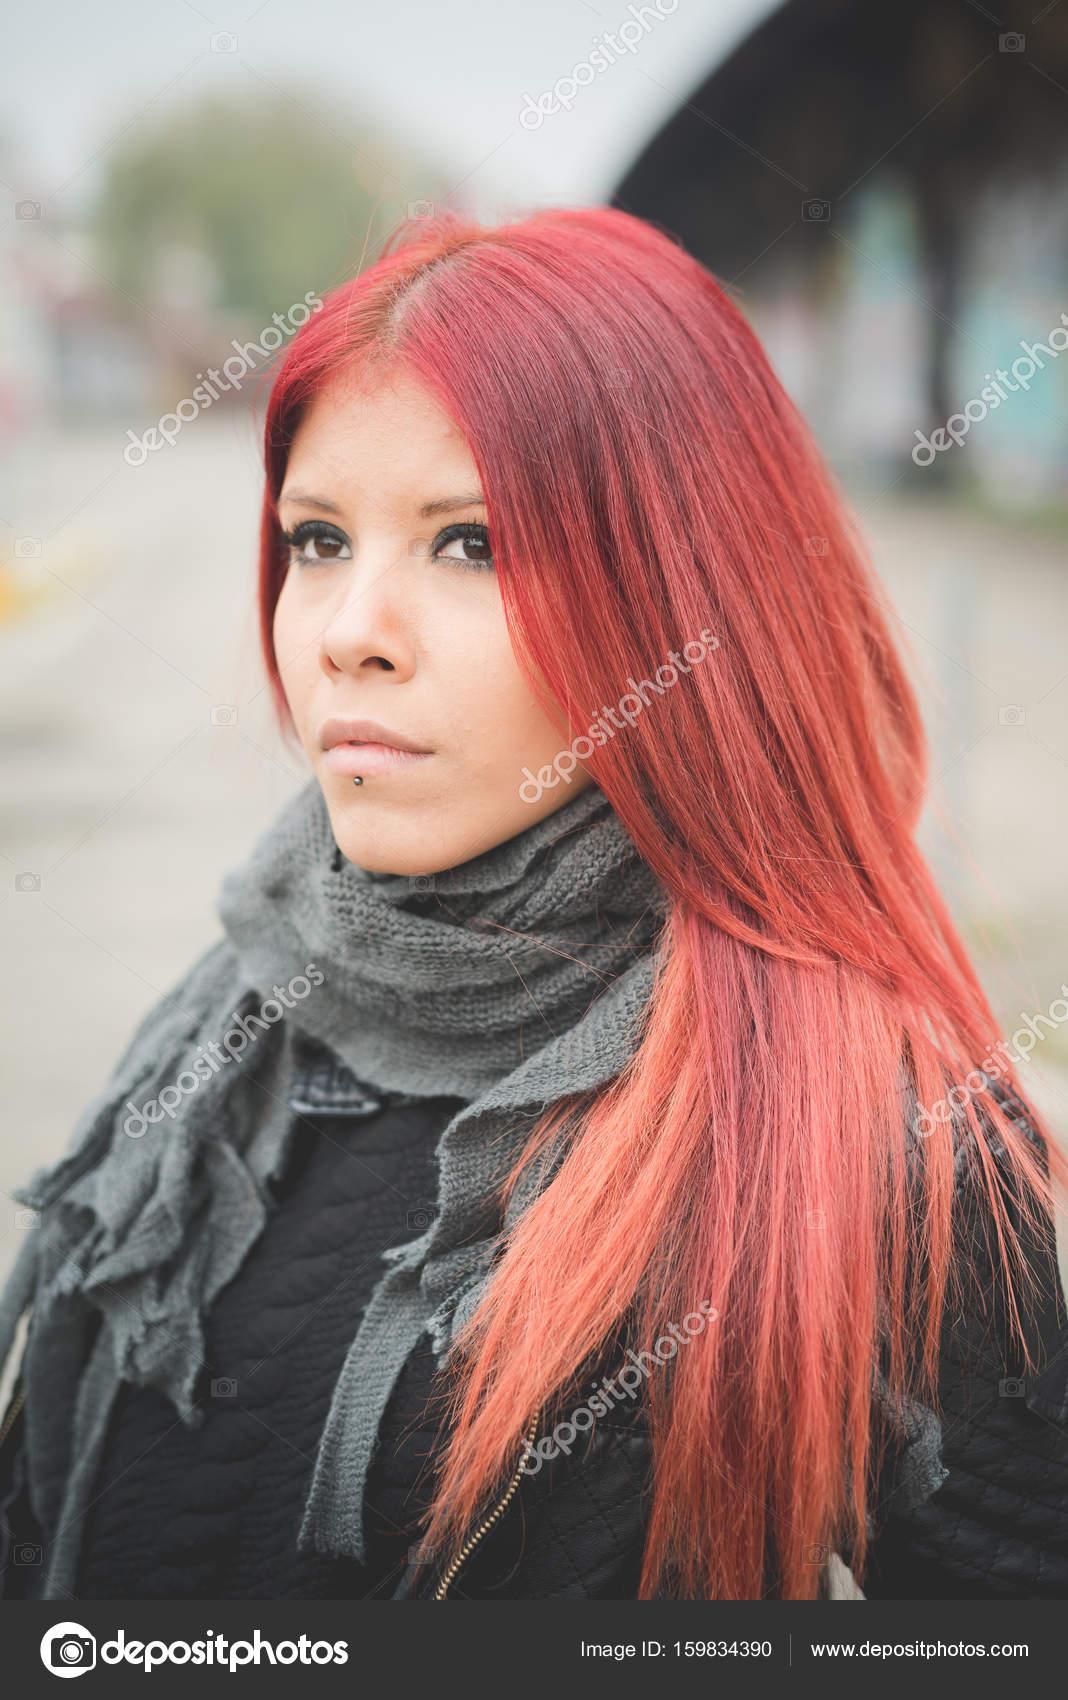 venezuelan girl image